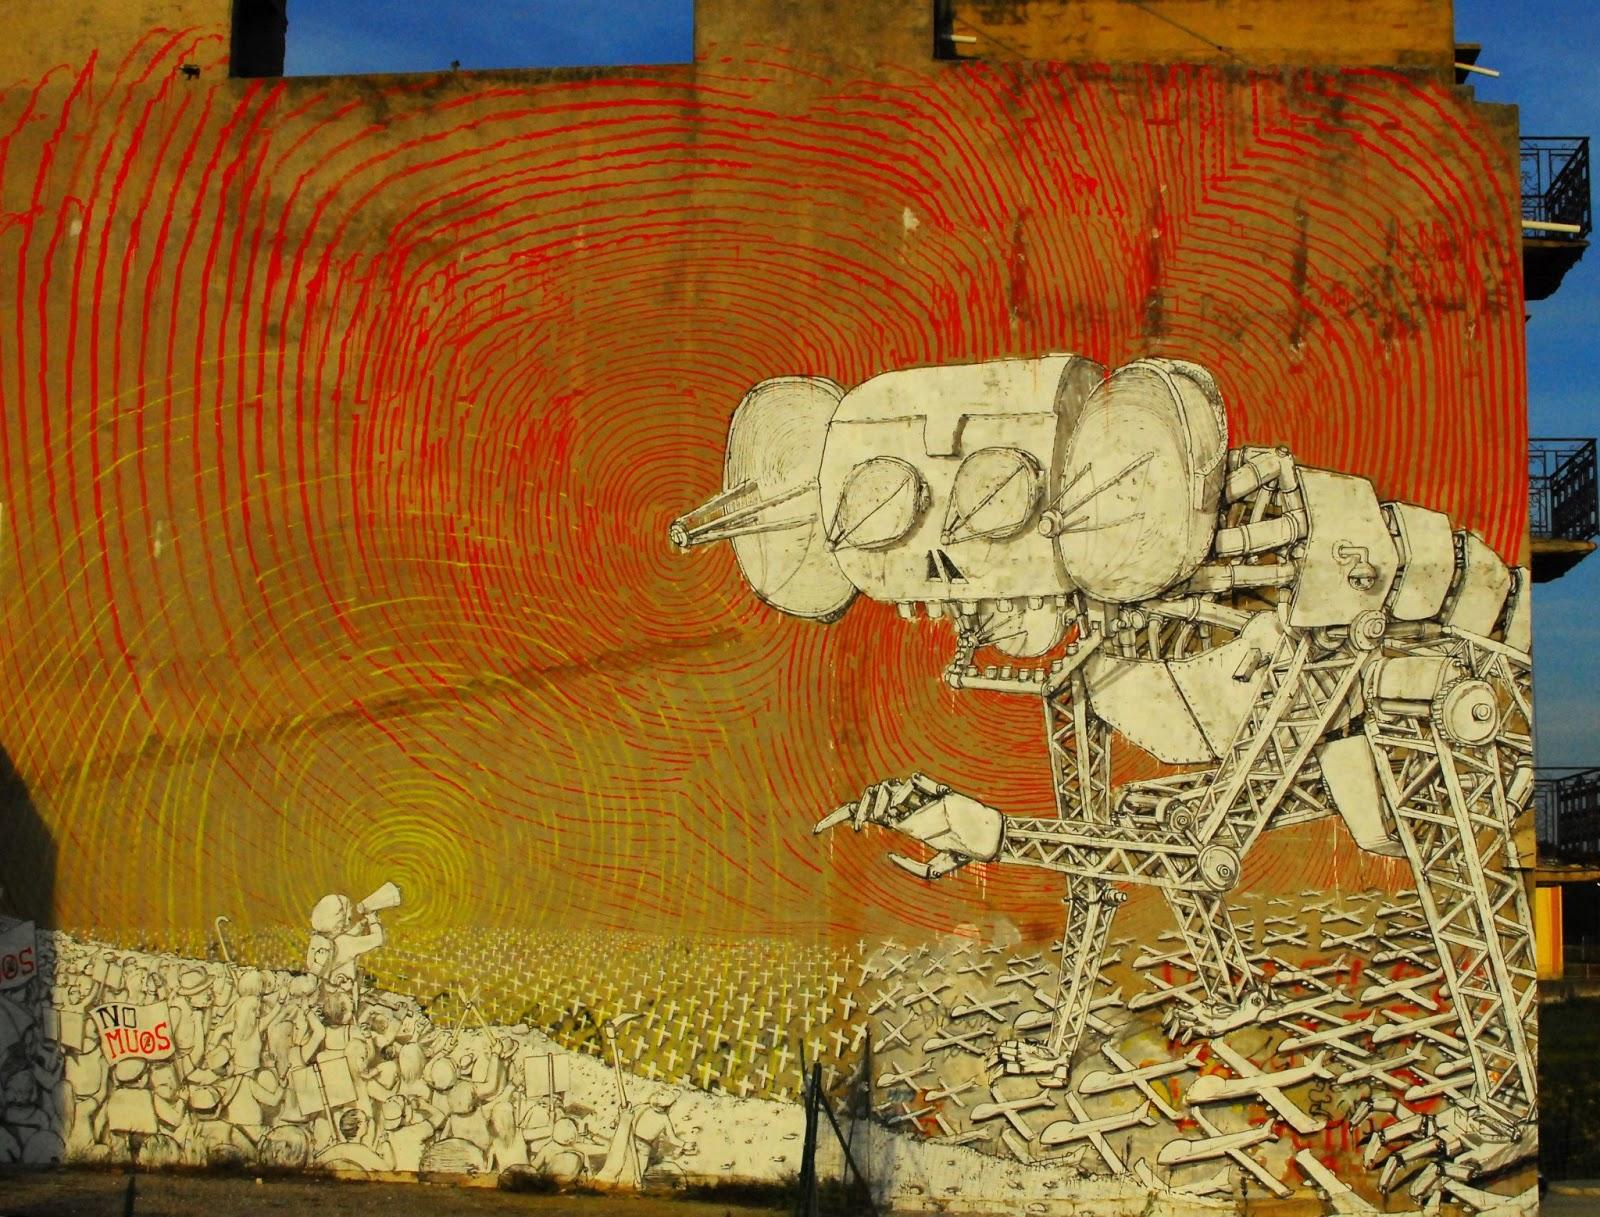 Blu New Murals In Niscemi, Italy | StreetArtNews | StreetArtNews